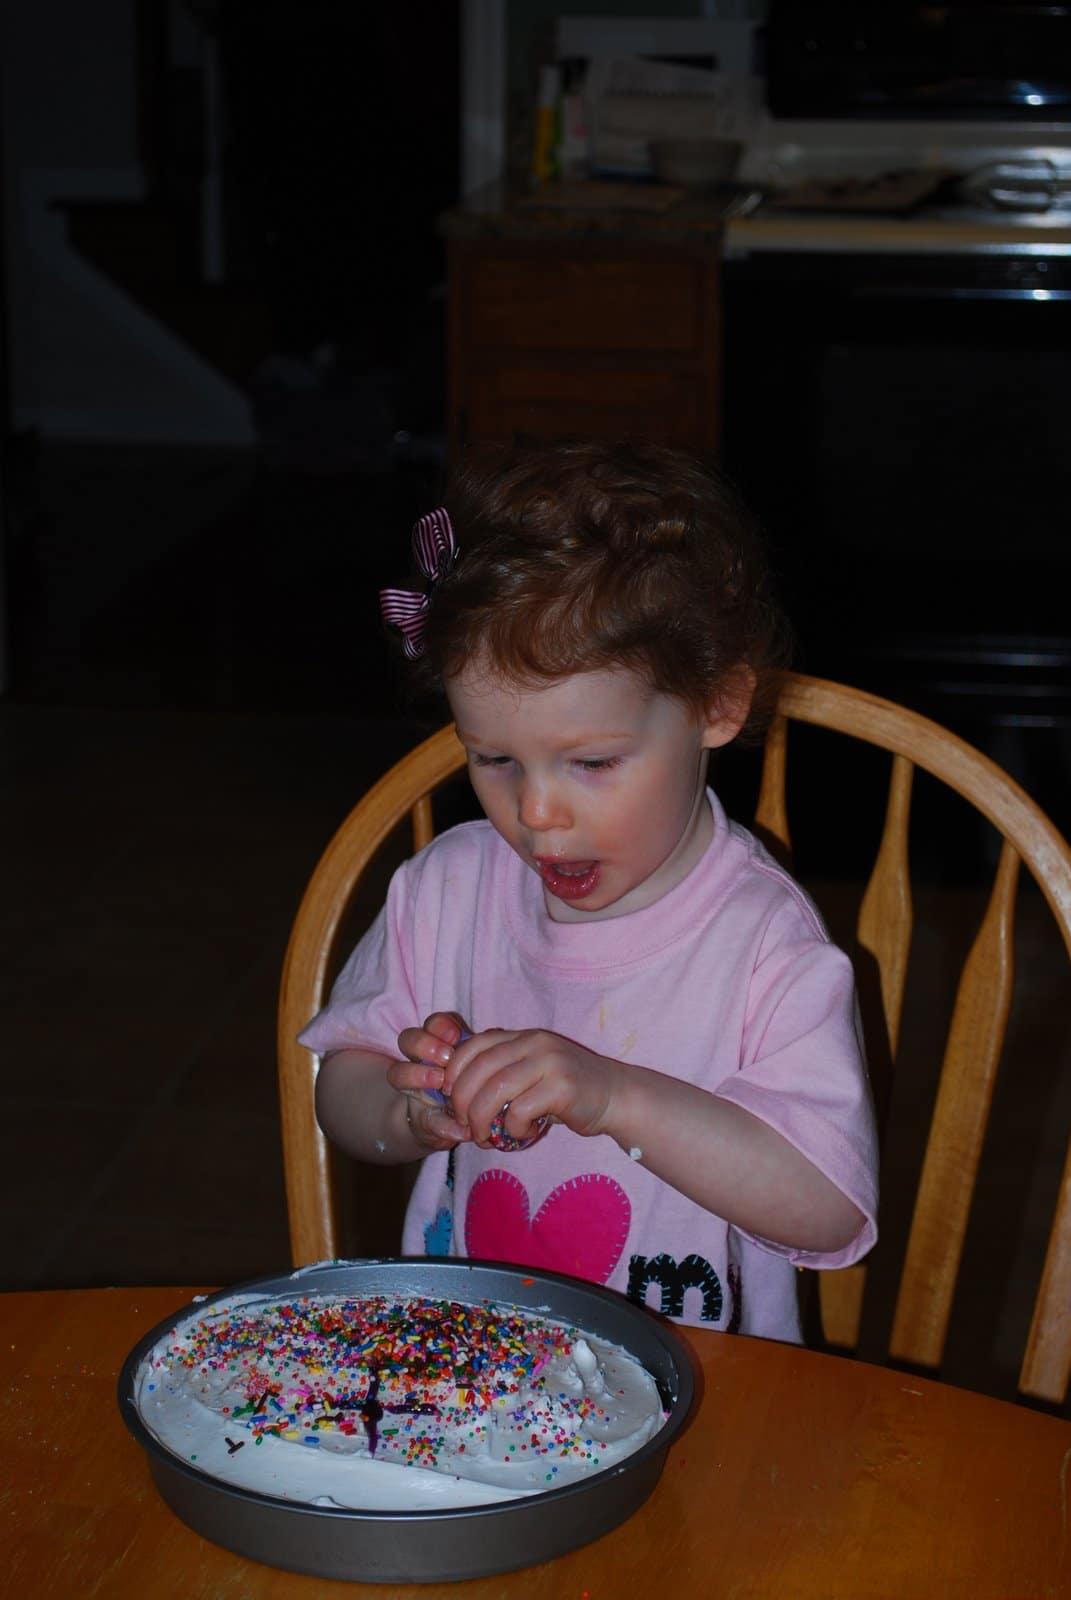 putting sprinkles on cake